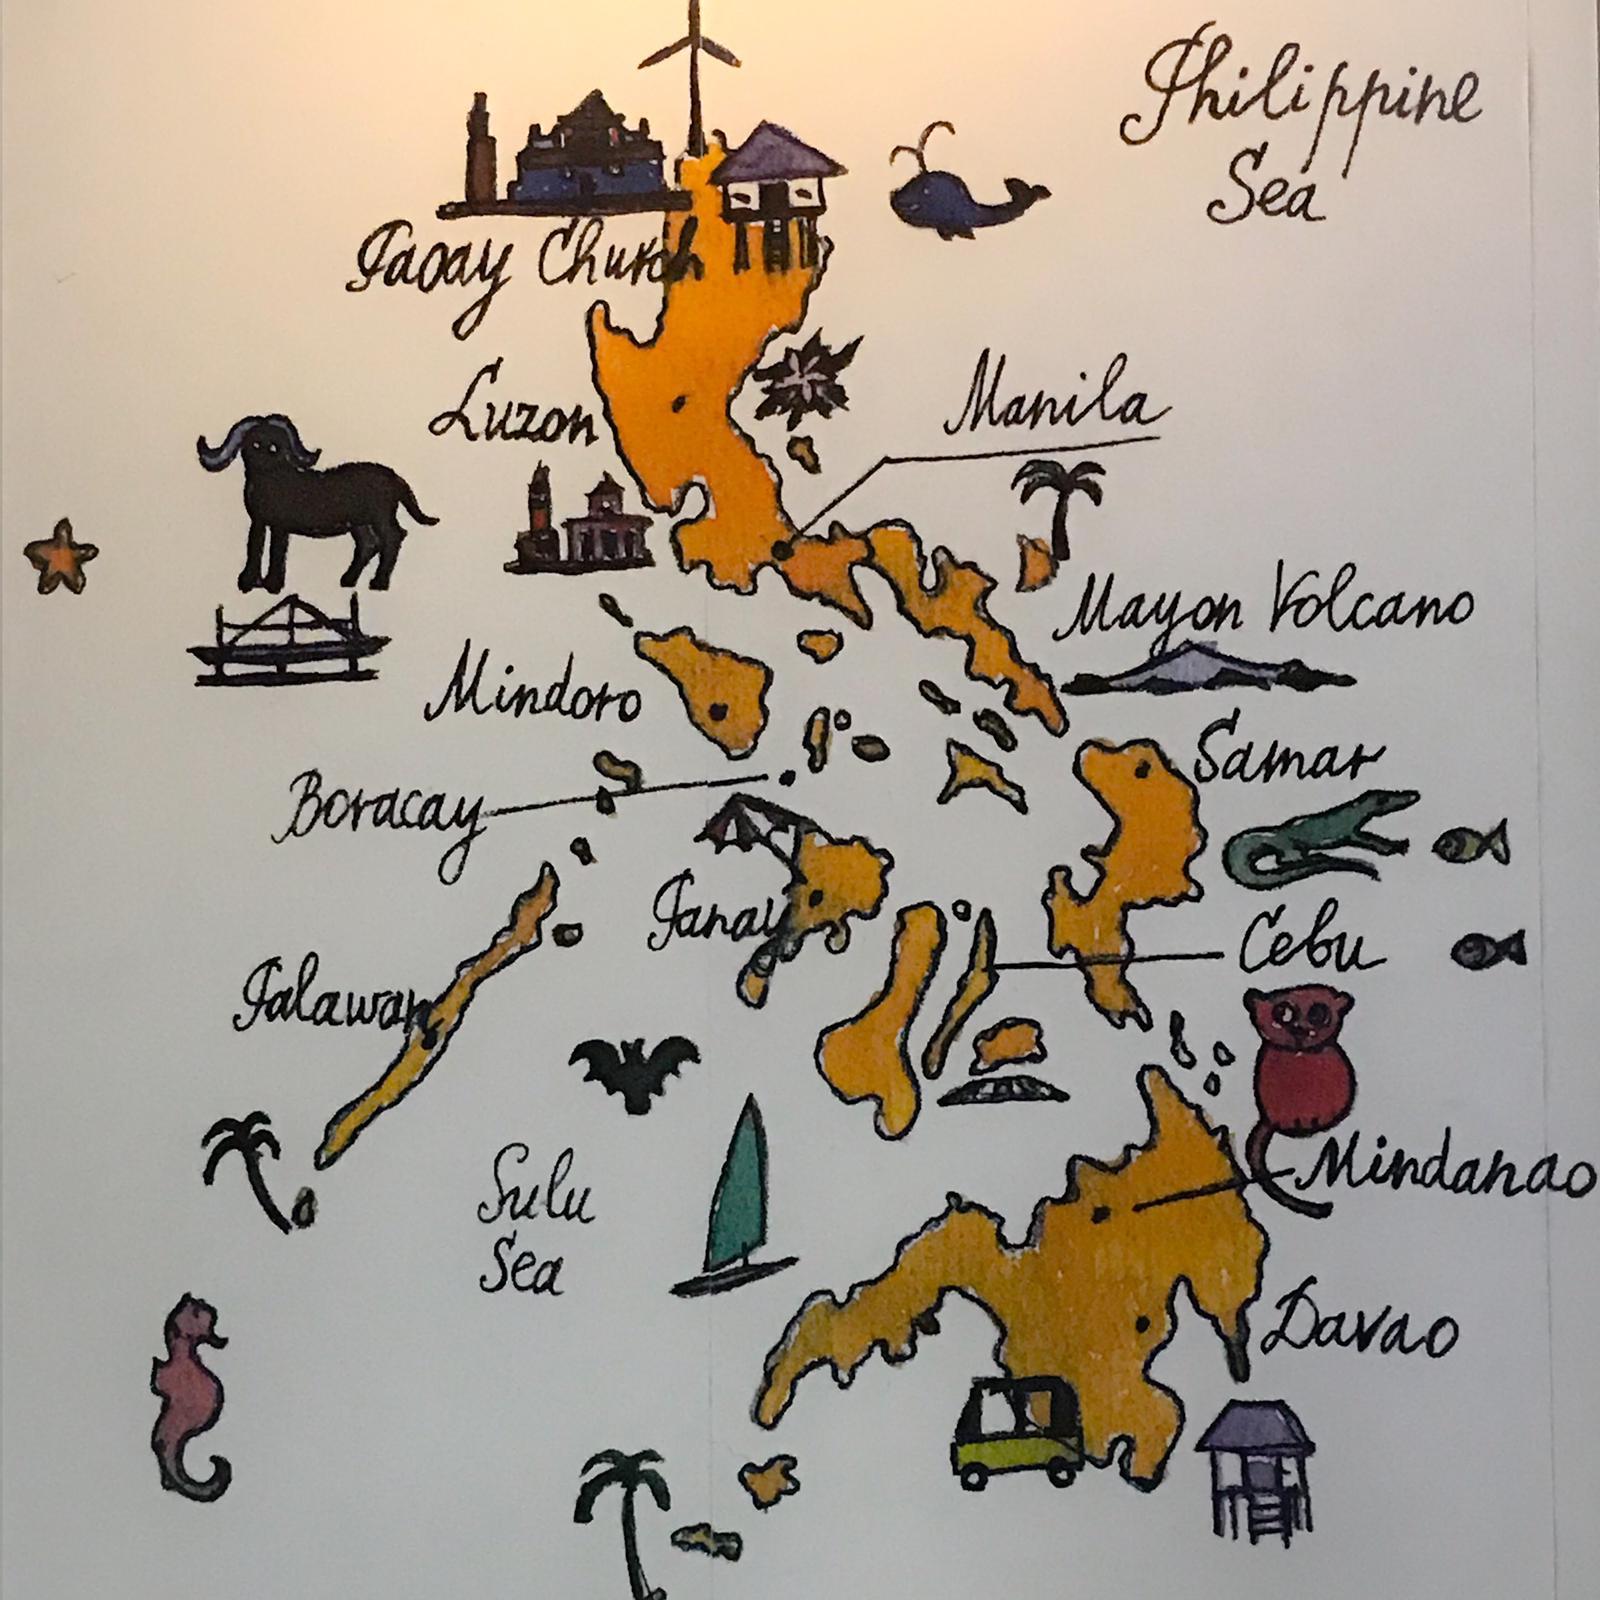 organiza tu viaje a Filipinas